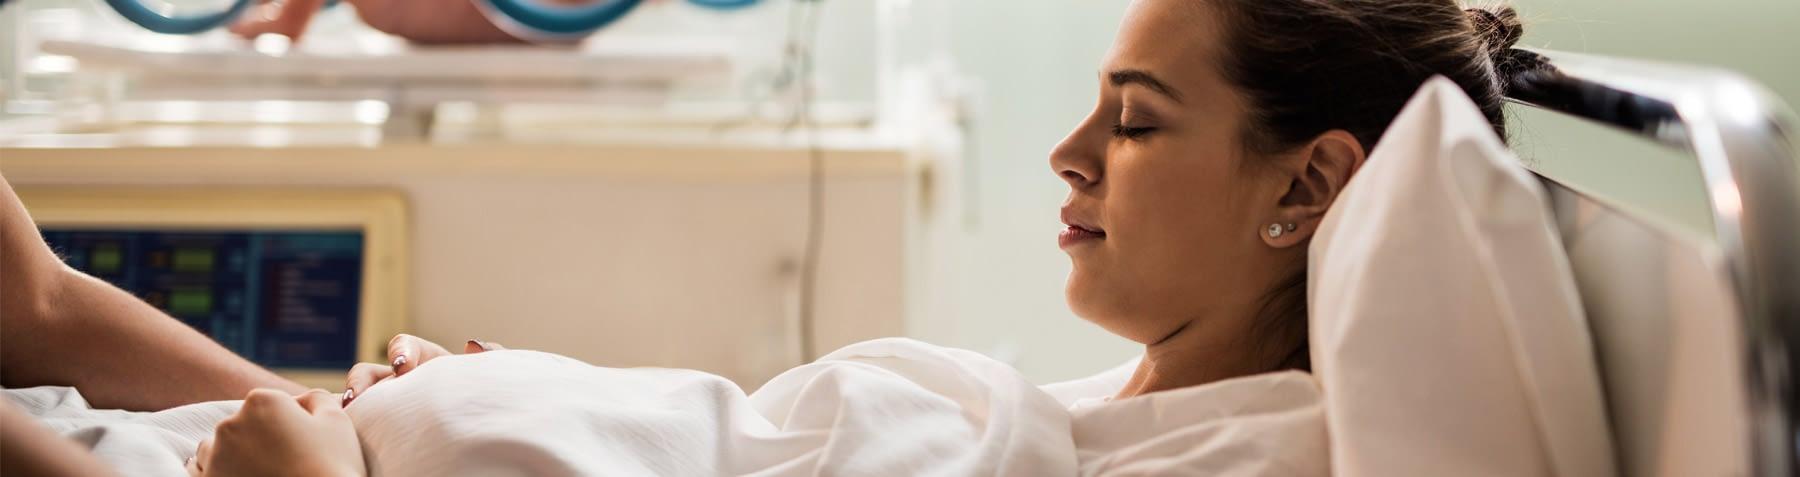 Obstetric negligence